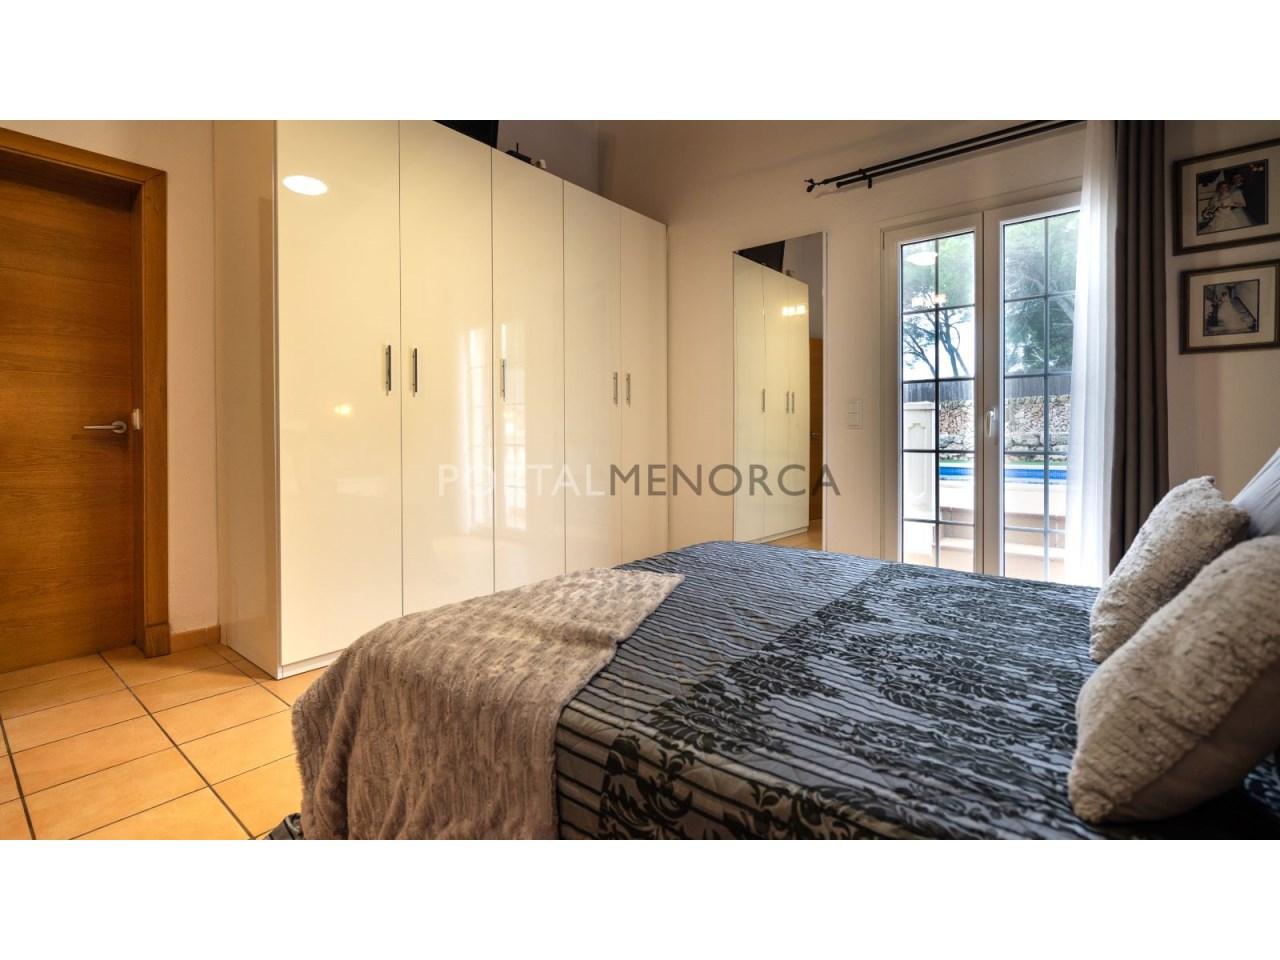 maison-campagne-acheter-menorca (3)